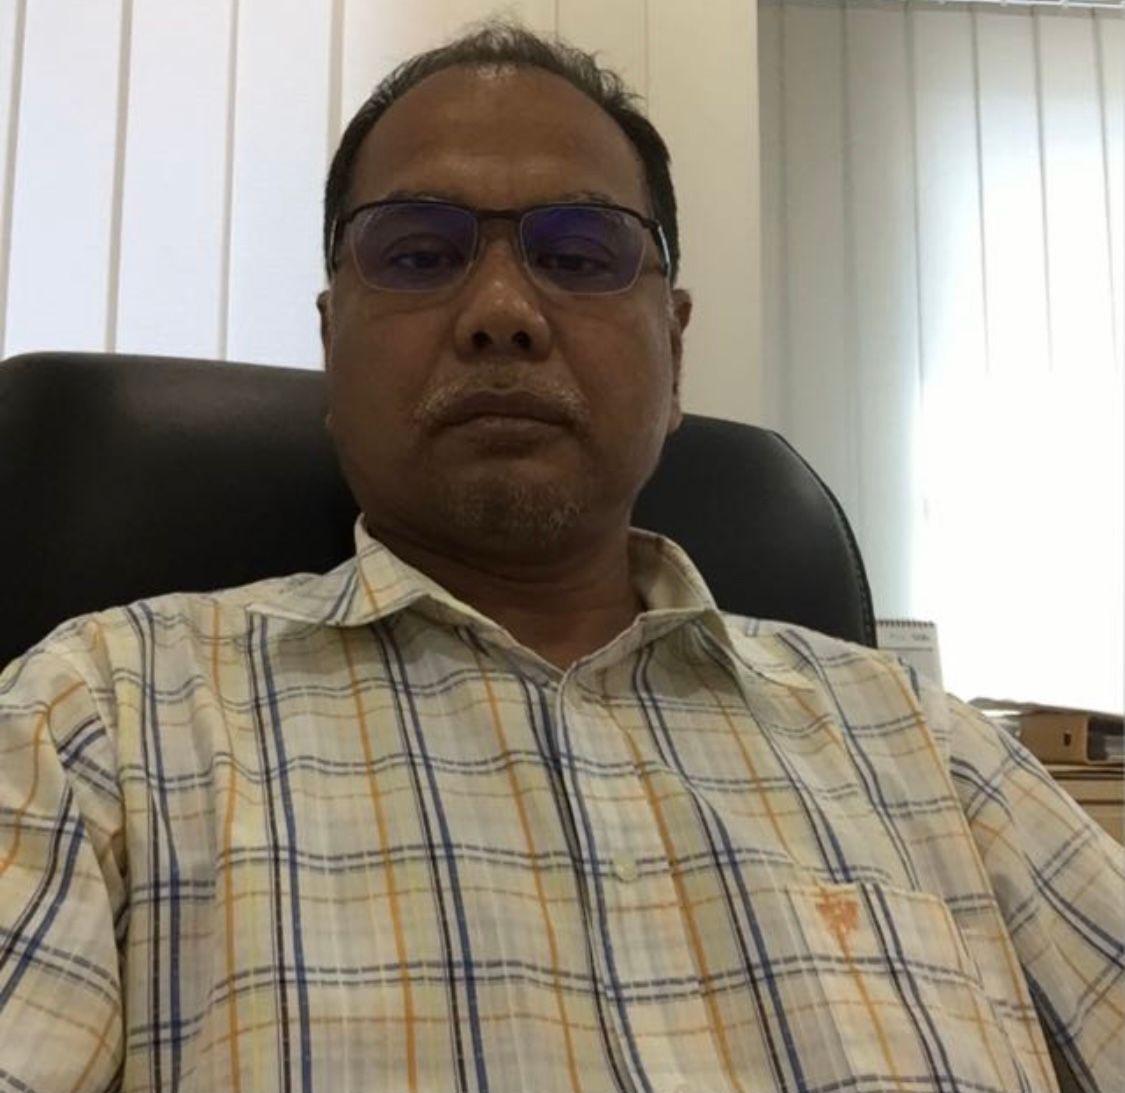 Mohd Yusri bin Ismail sitting in an office. He is wearing a chequered shirt.